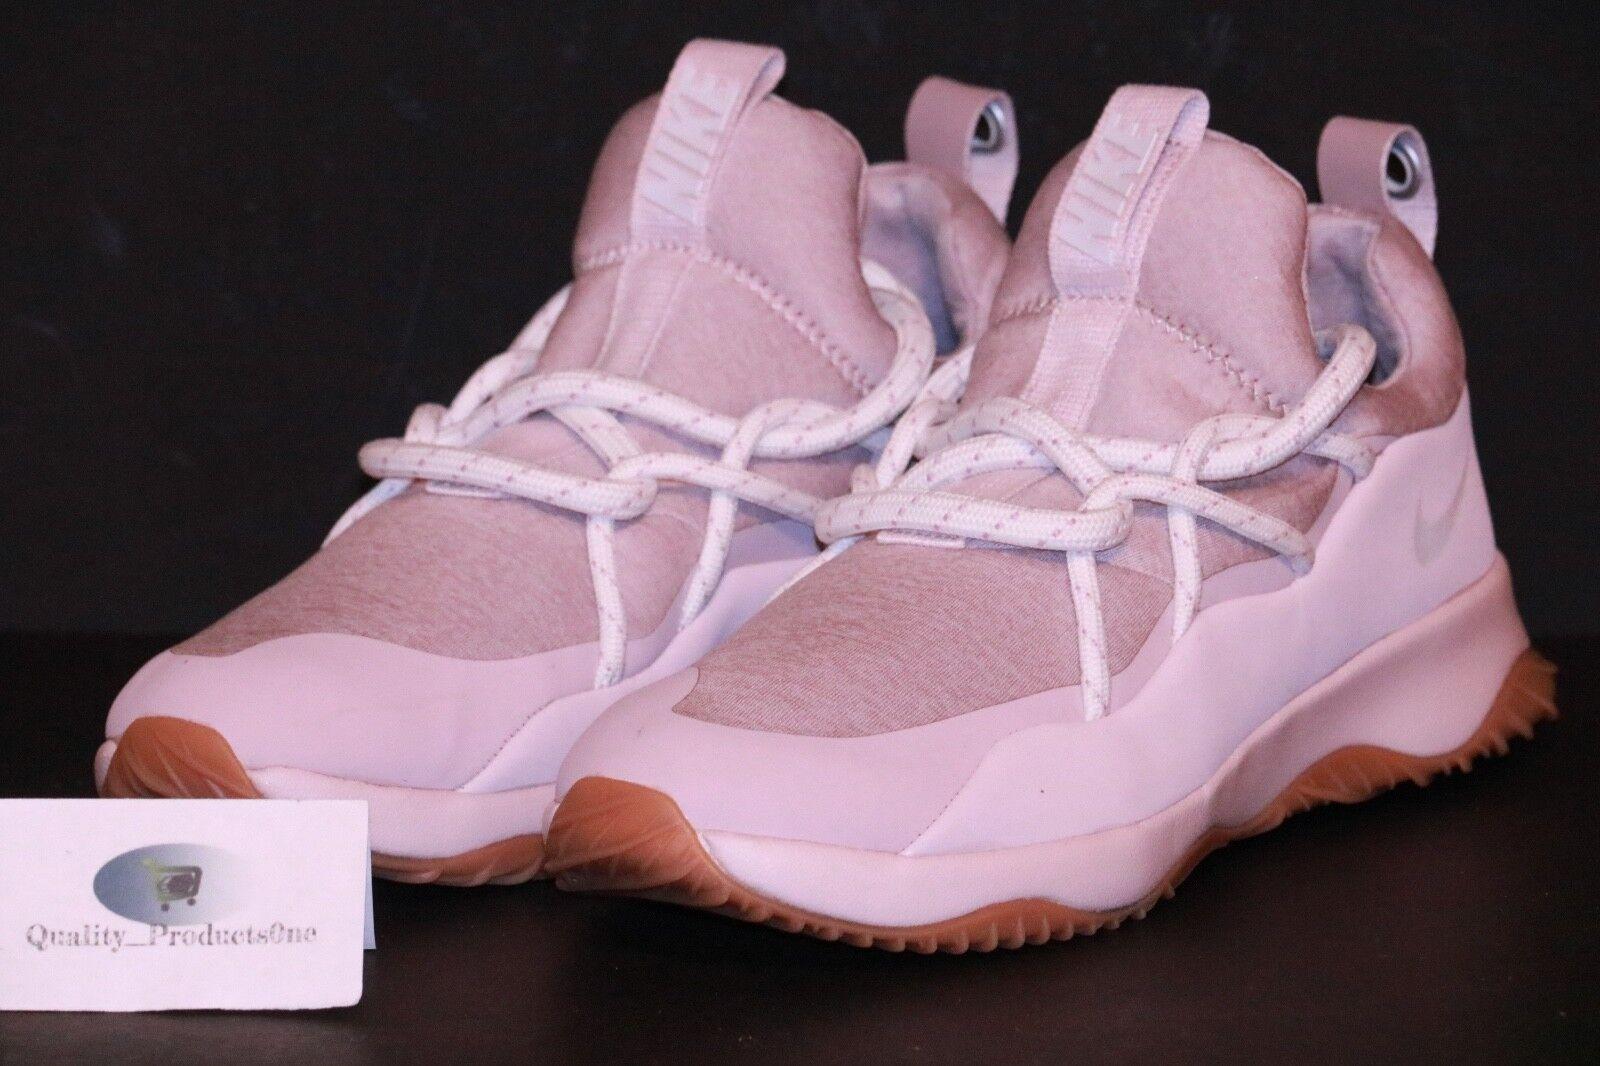 Nike City Loop Particle Rose Pink Gum Women Casual Shoes Sneaker AA1097 601 Sz 9